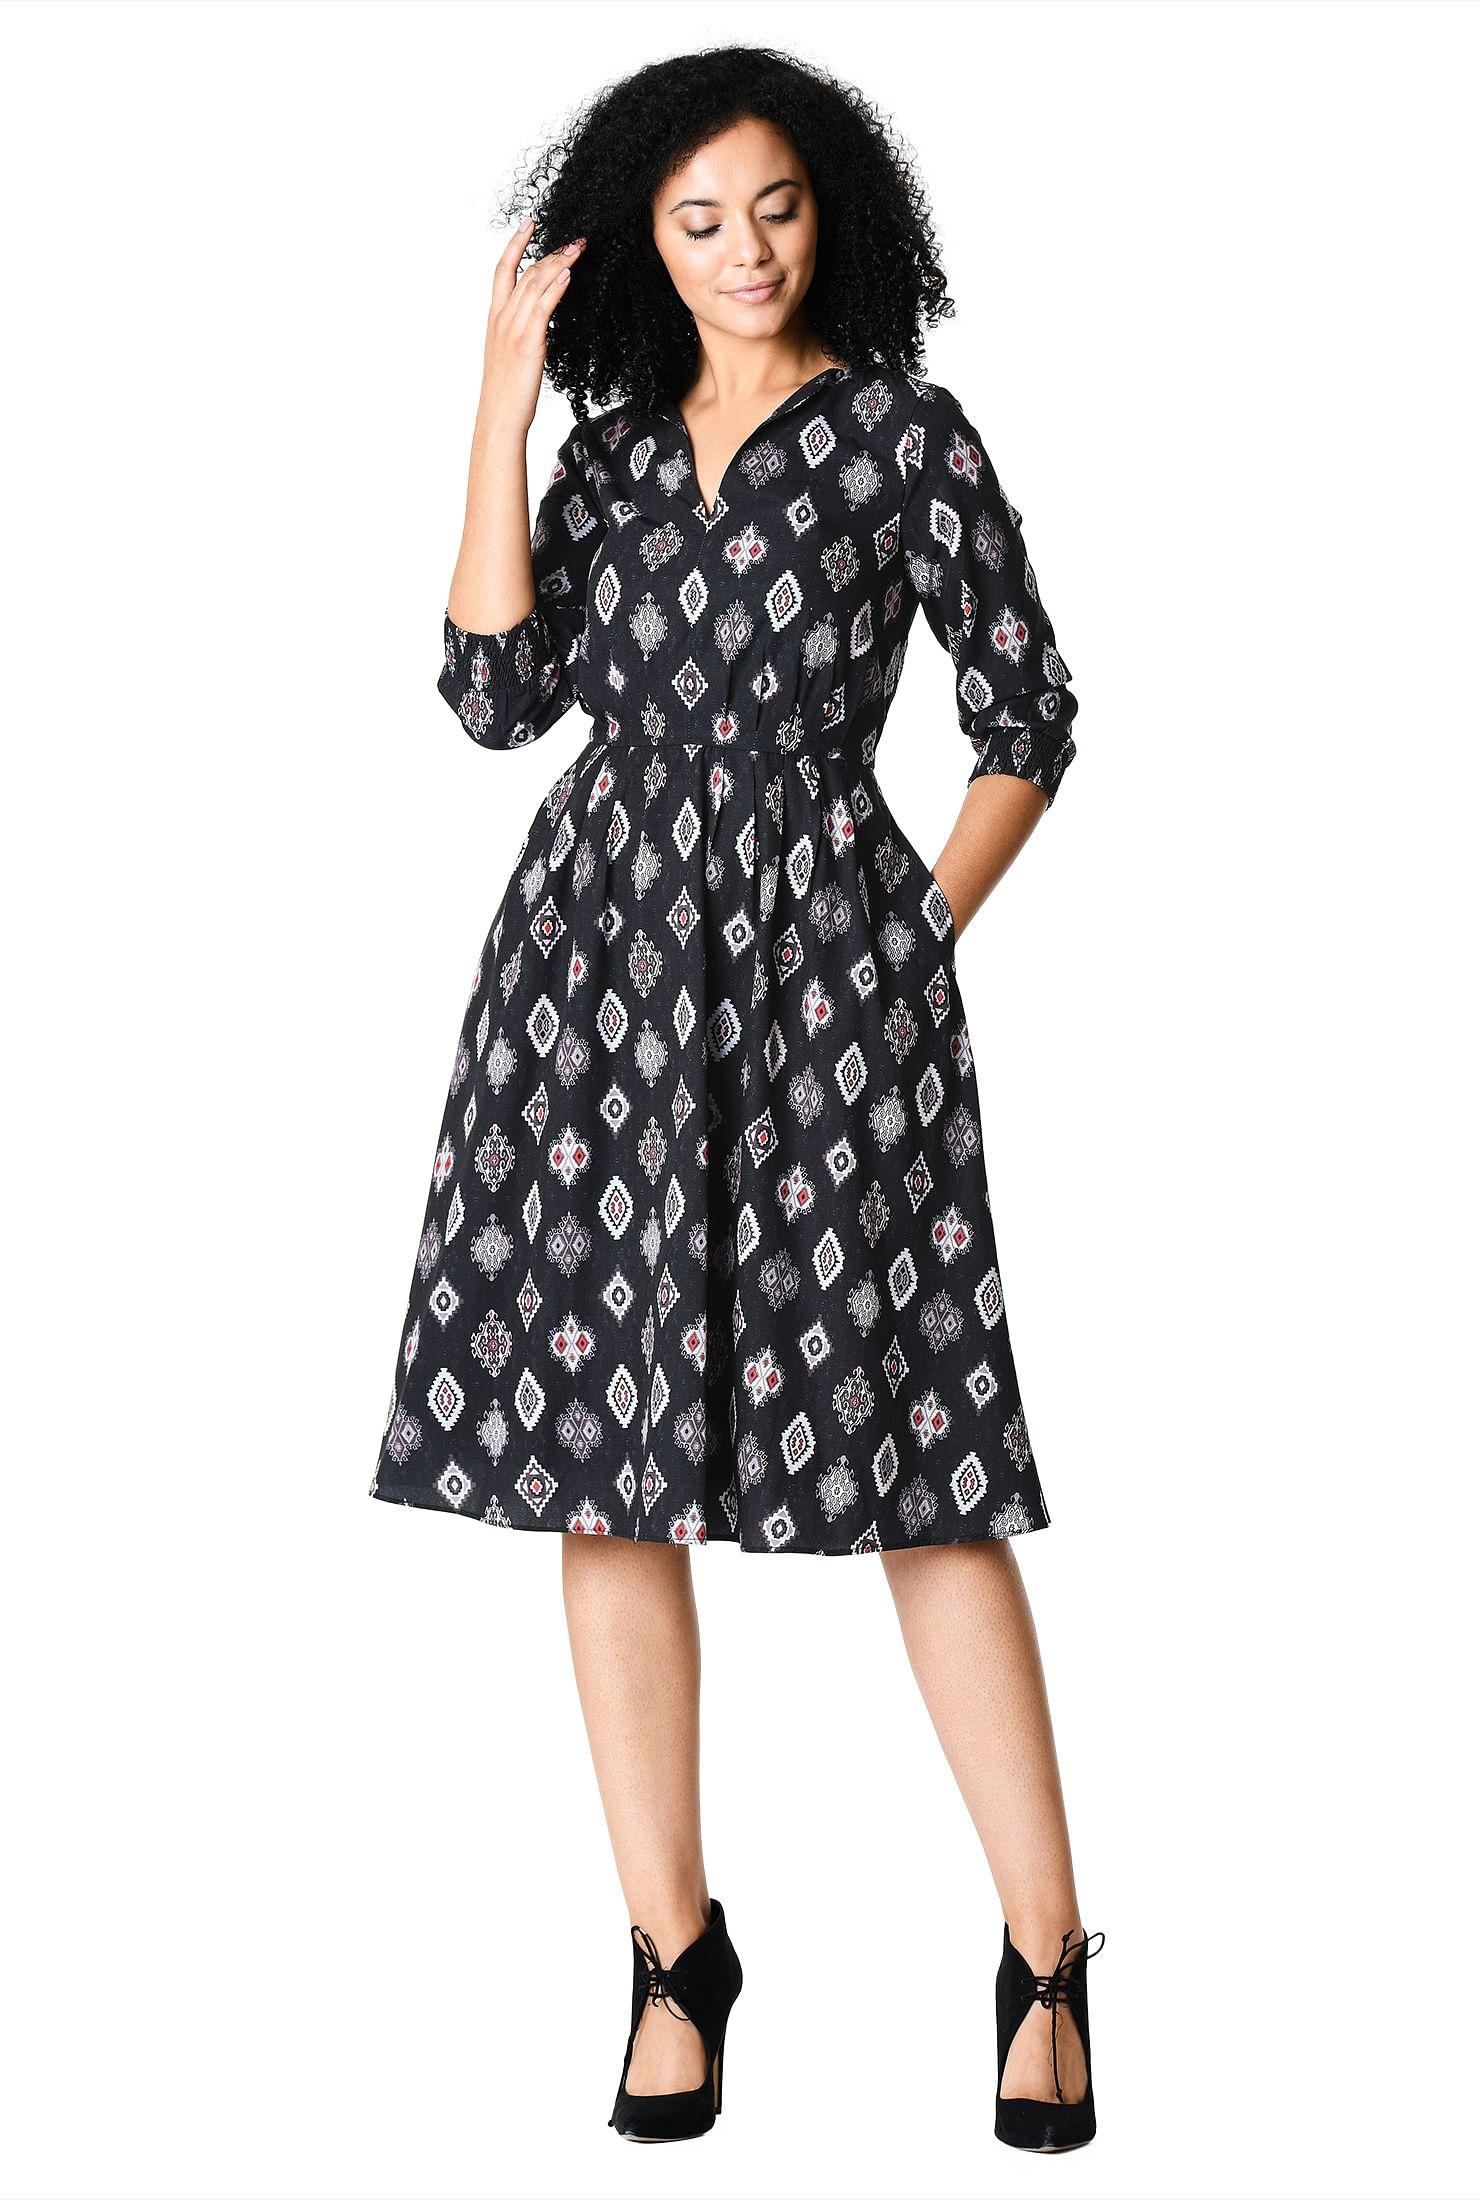 88dd47f08def7 below knee length dresses, boat neck dresses, graphic print dresses,  lightweight Dresses